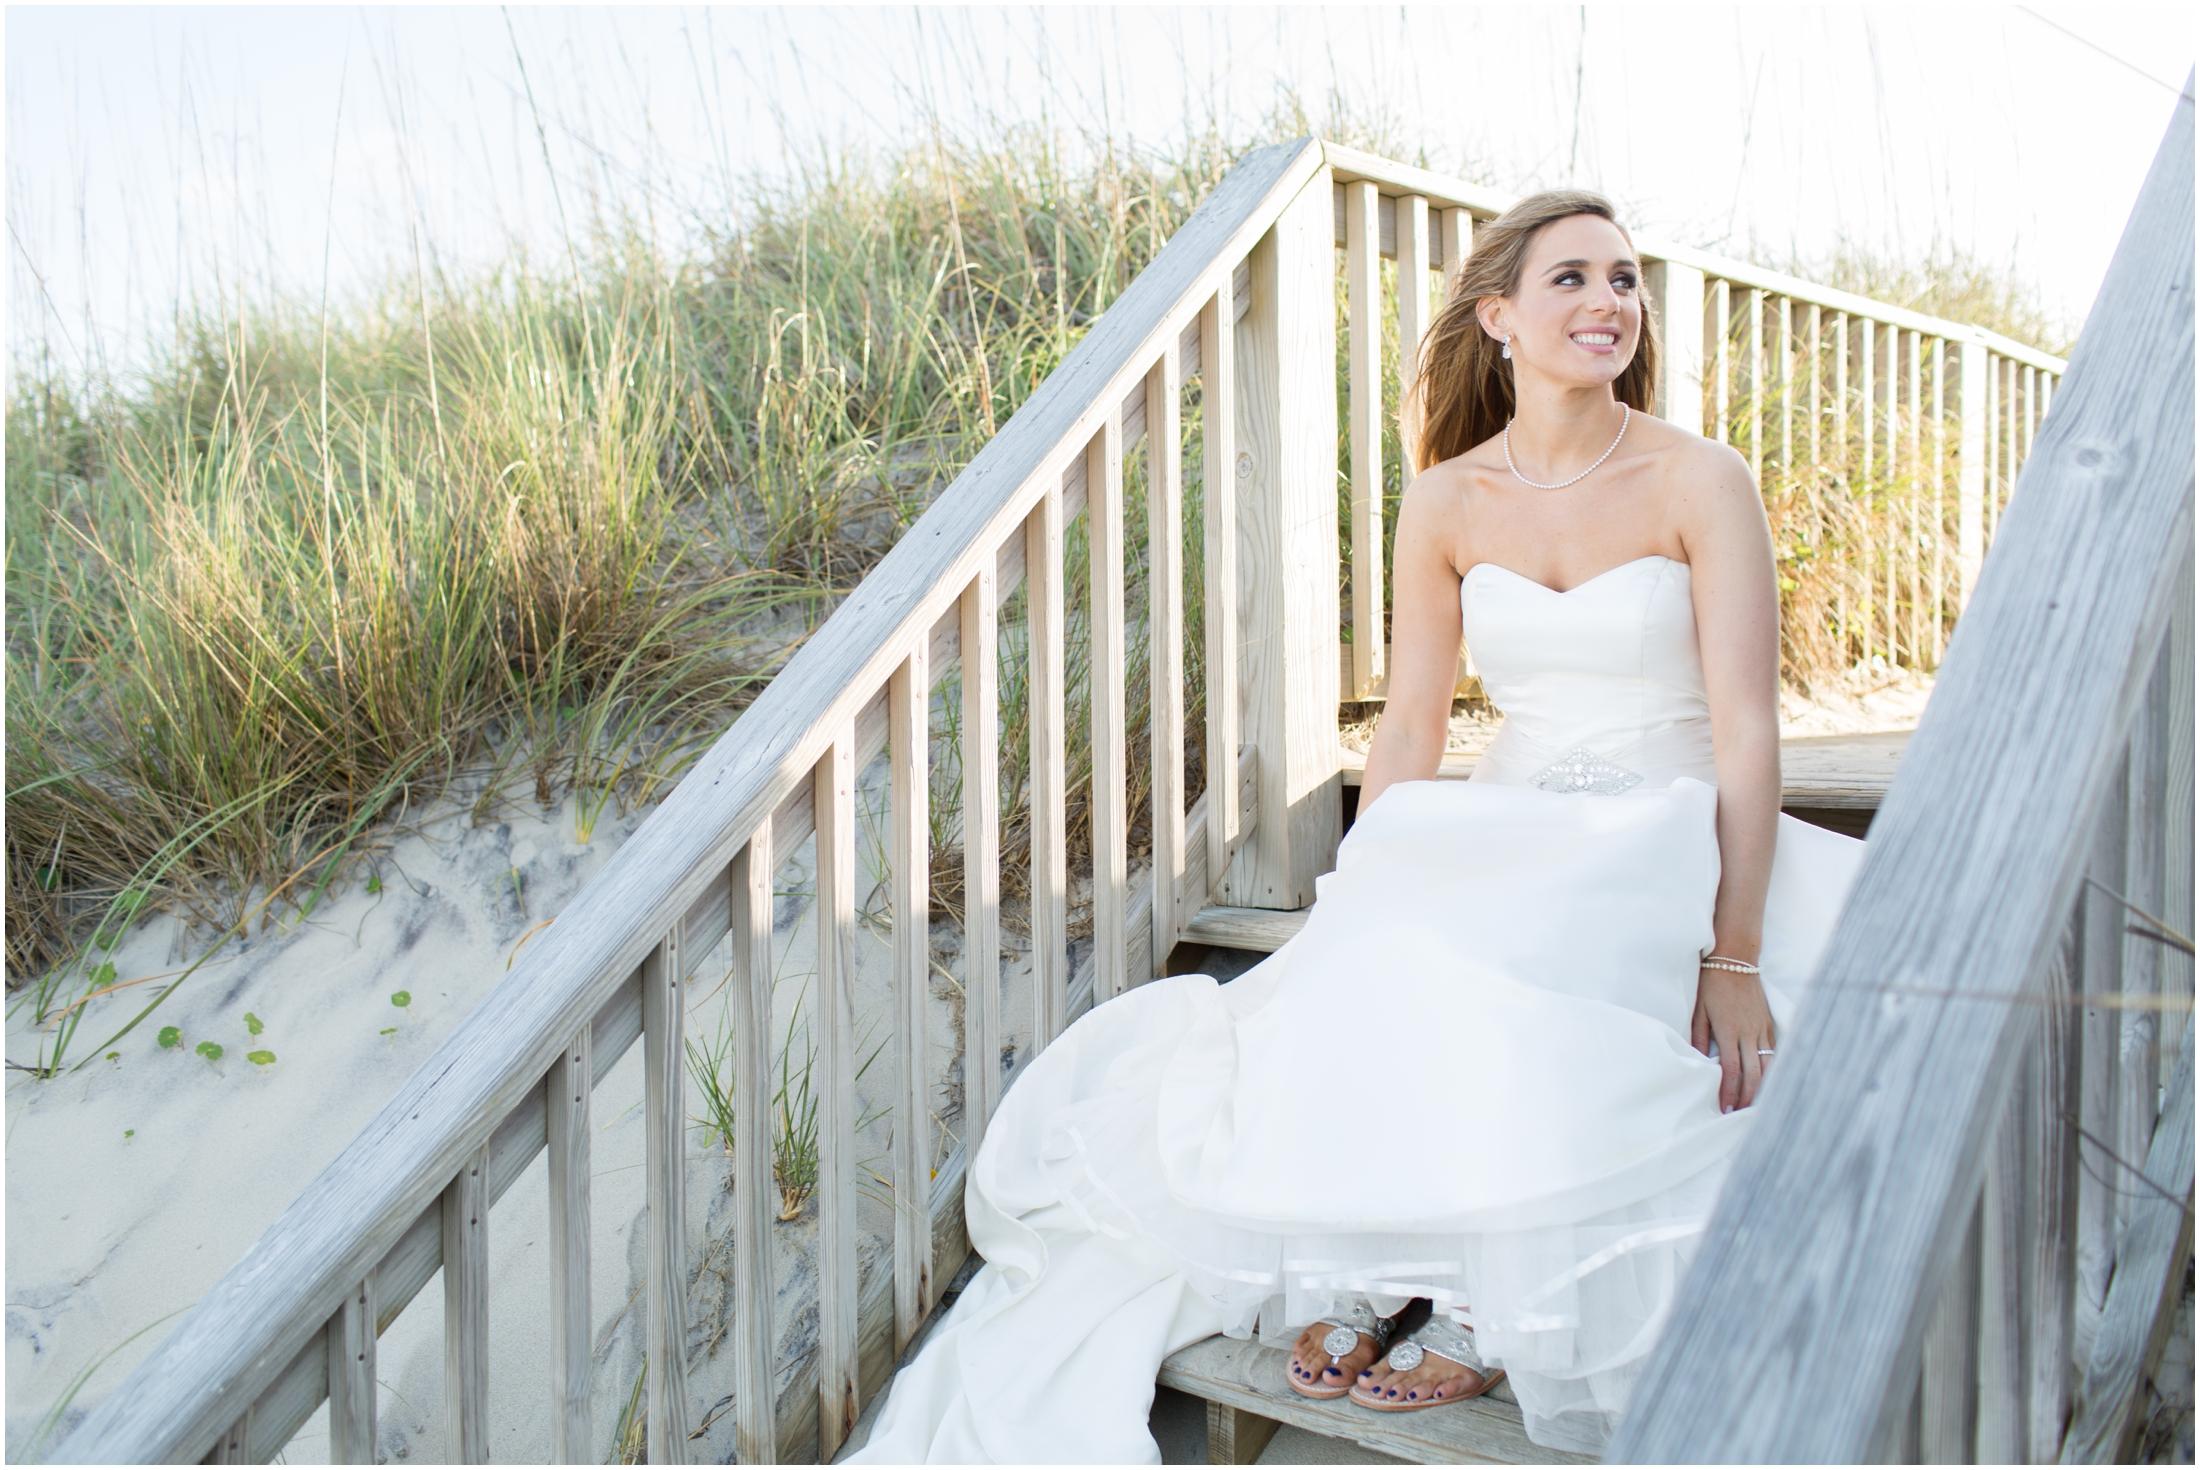 Pearce-Wedding-Bride-and-Groom-Portraits-846.jpg